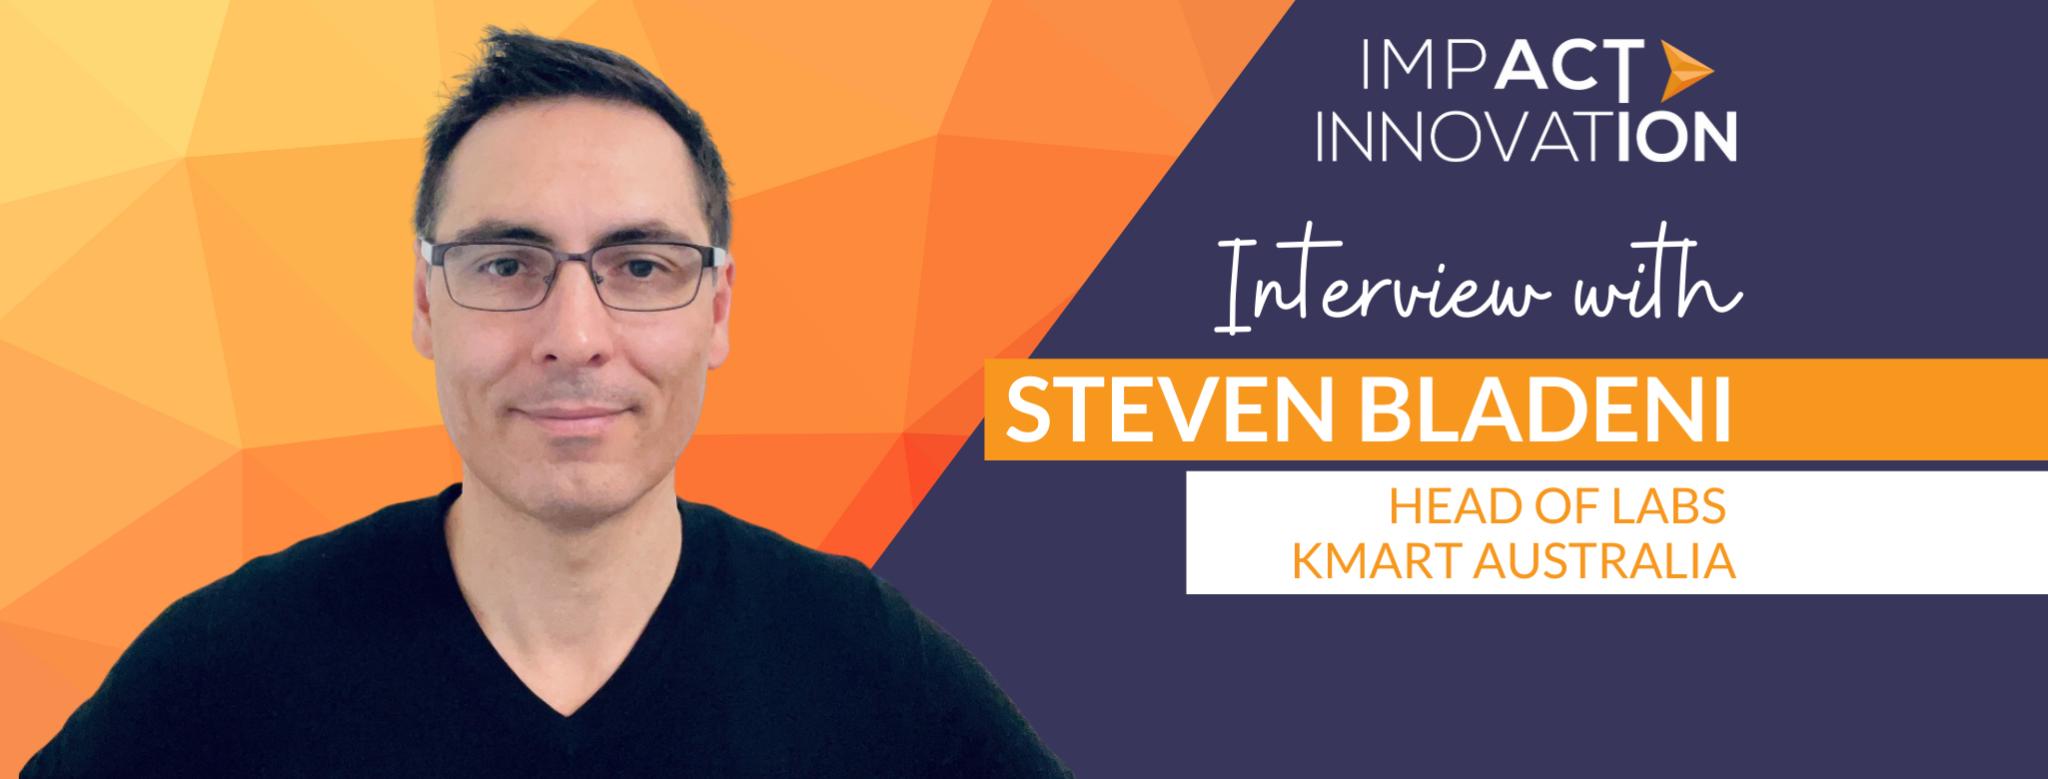 Steven Bladeni, Head of Labs at Kmart Australia